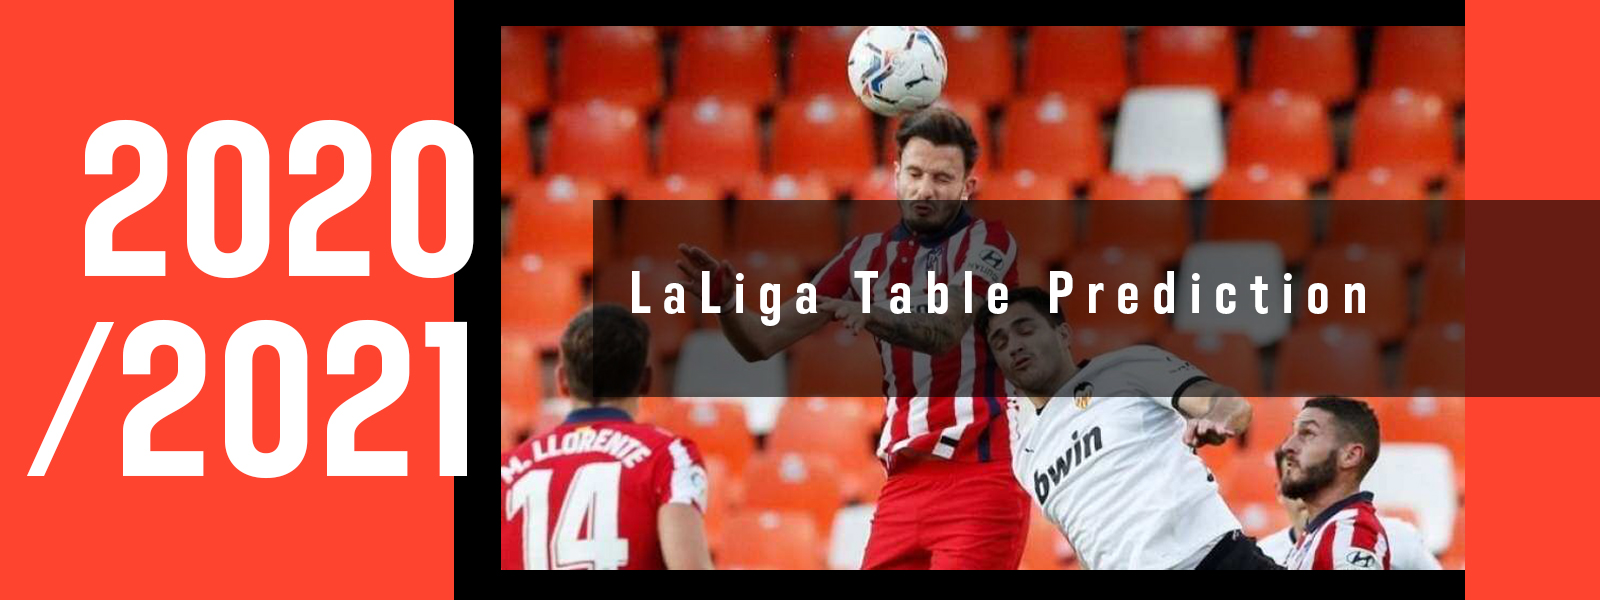 2020/2021 Spanish La Liga Table Prediction